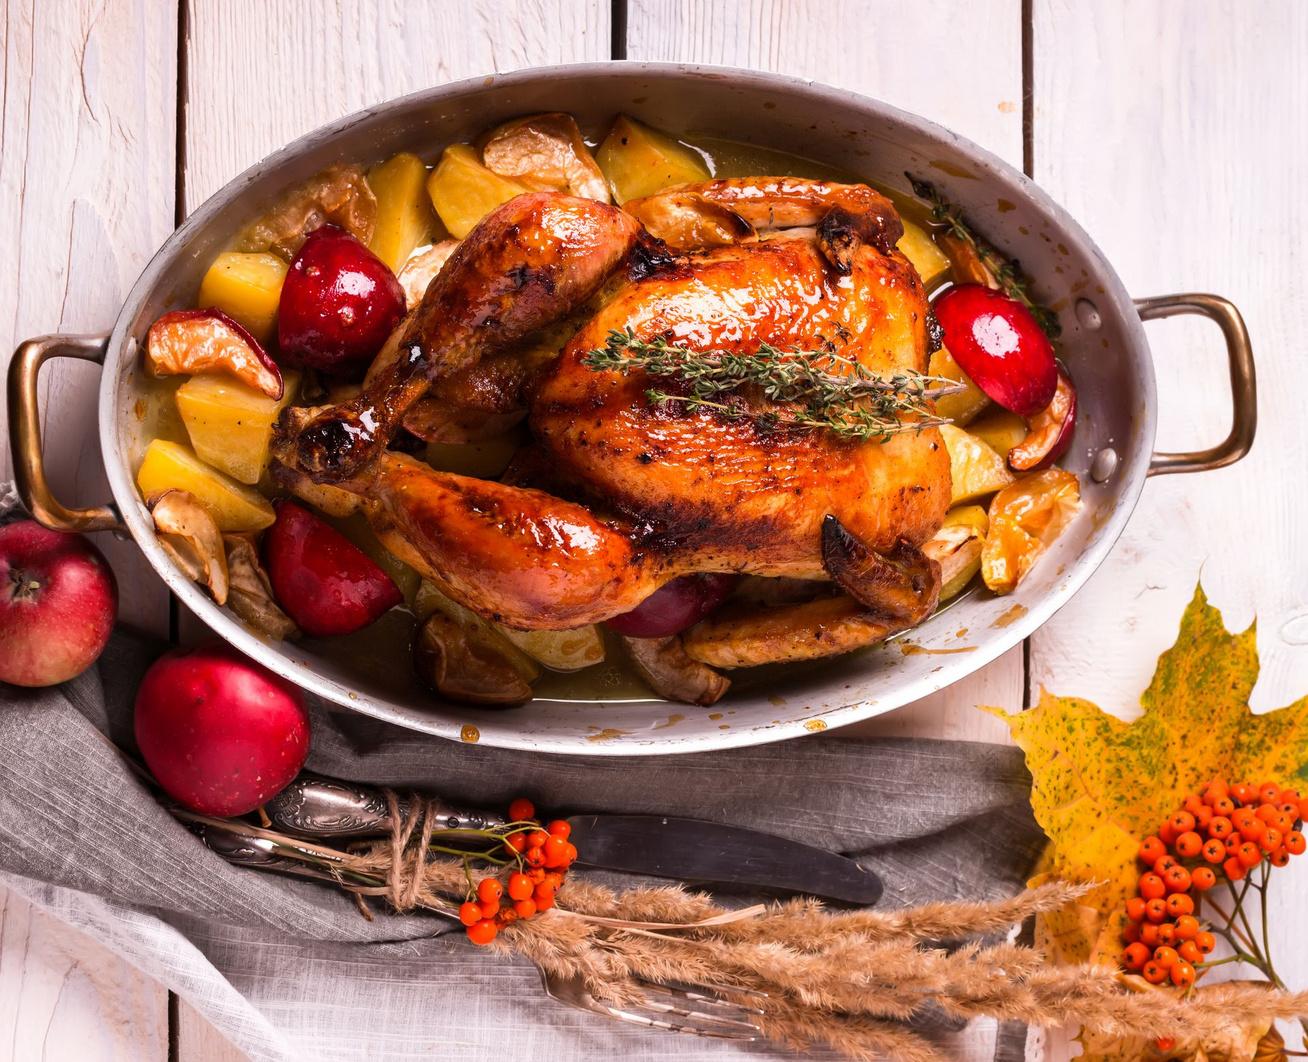 egeszben-sult-csirke-almaval-krumplival